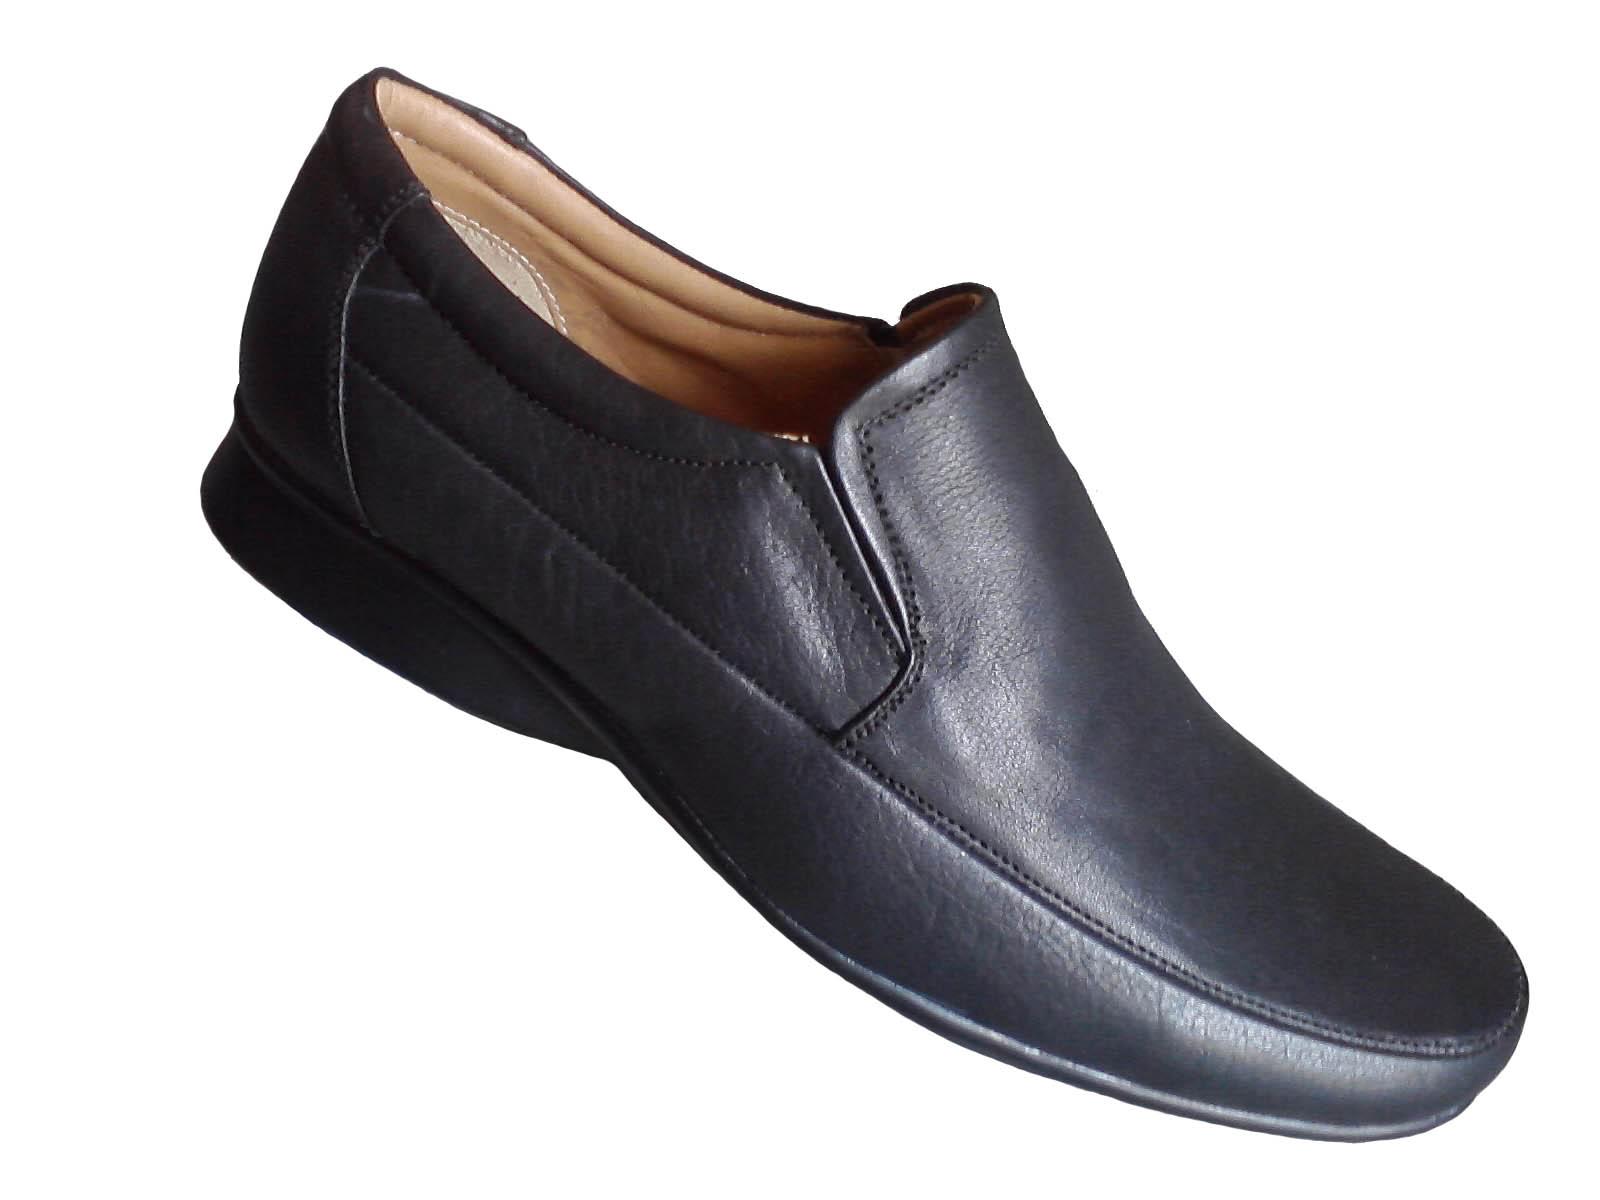 mens formal shoes manufacturer manufacturer from agra